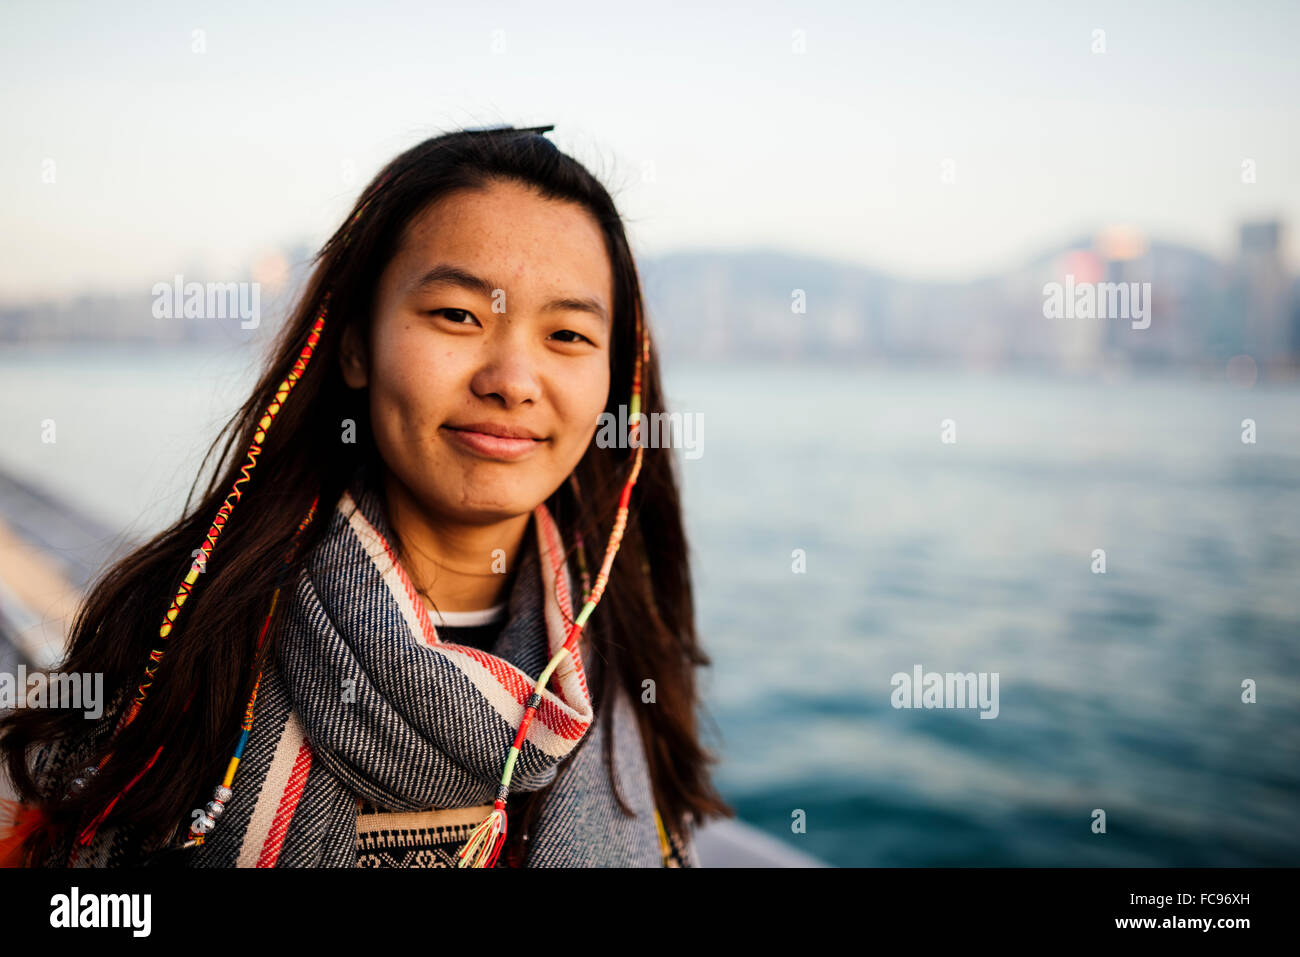 Portrait of young woman, Avenue of Stars, Tsim Sha Tsui Waterfront, Kowloon, Hong Kong, China, Asia - Stock Image